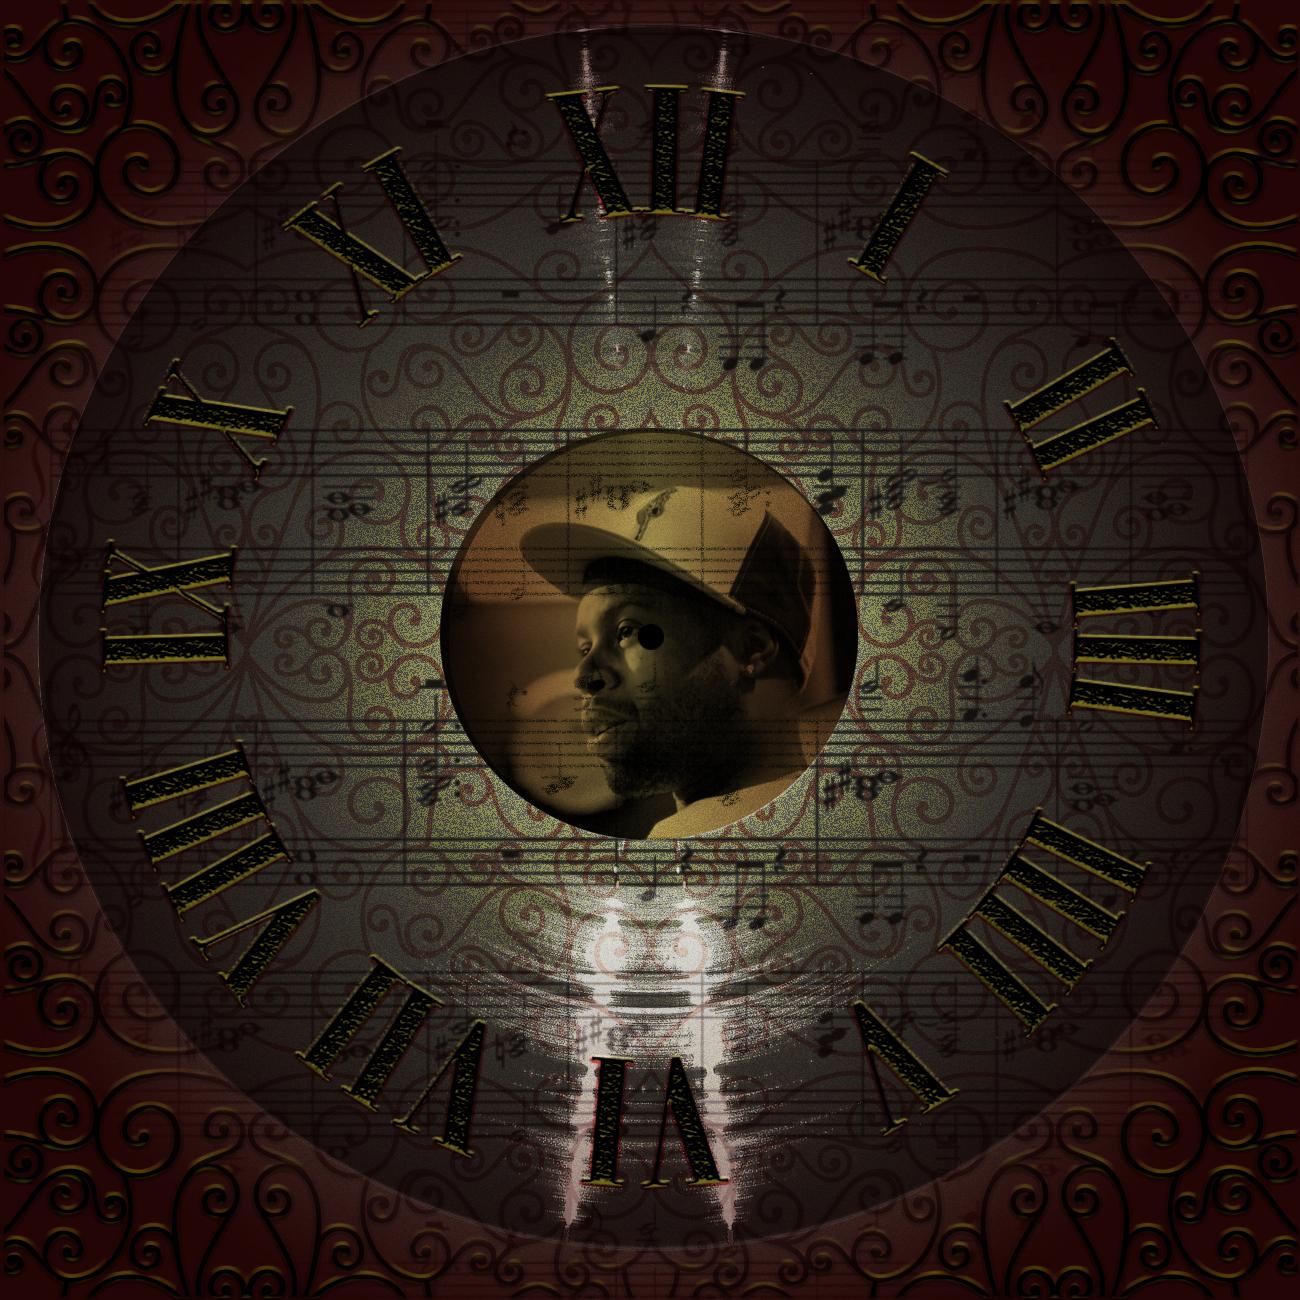 Timeless: J Dilla artwork